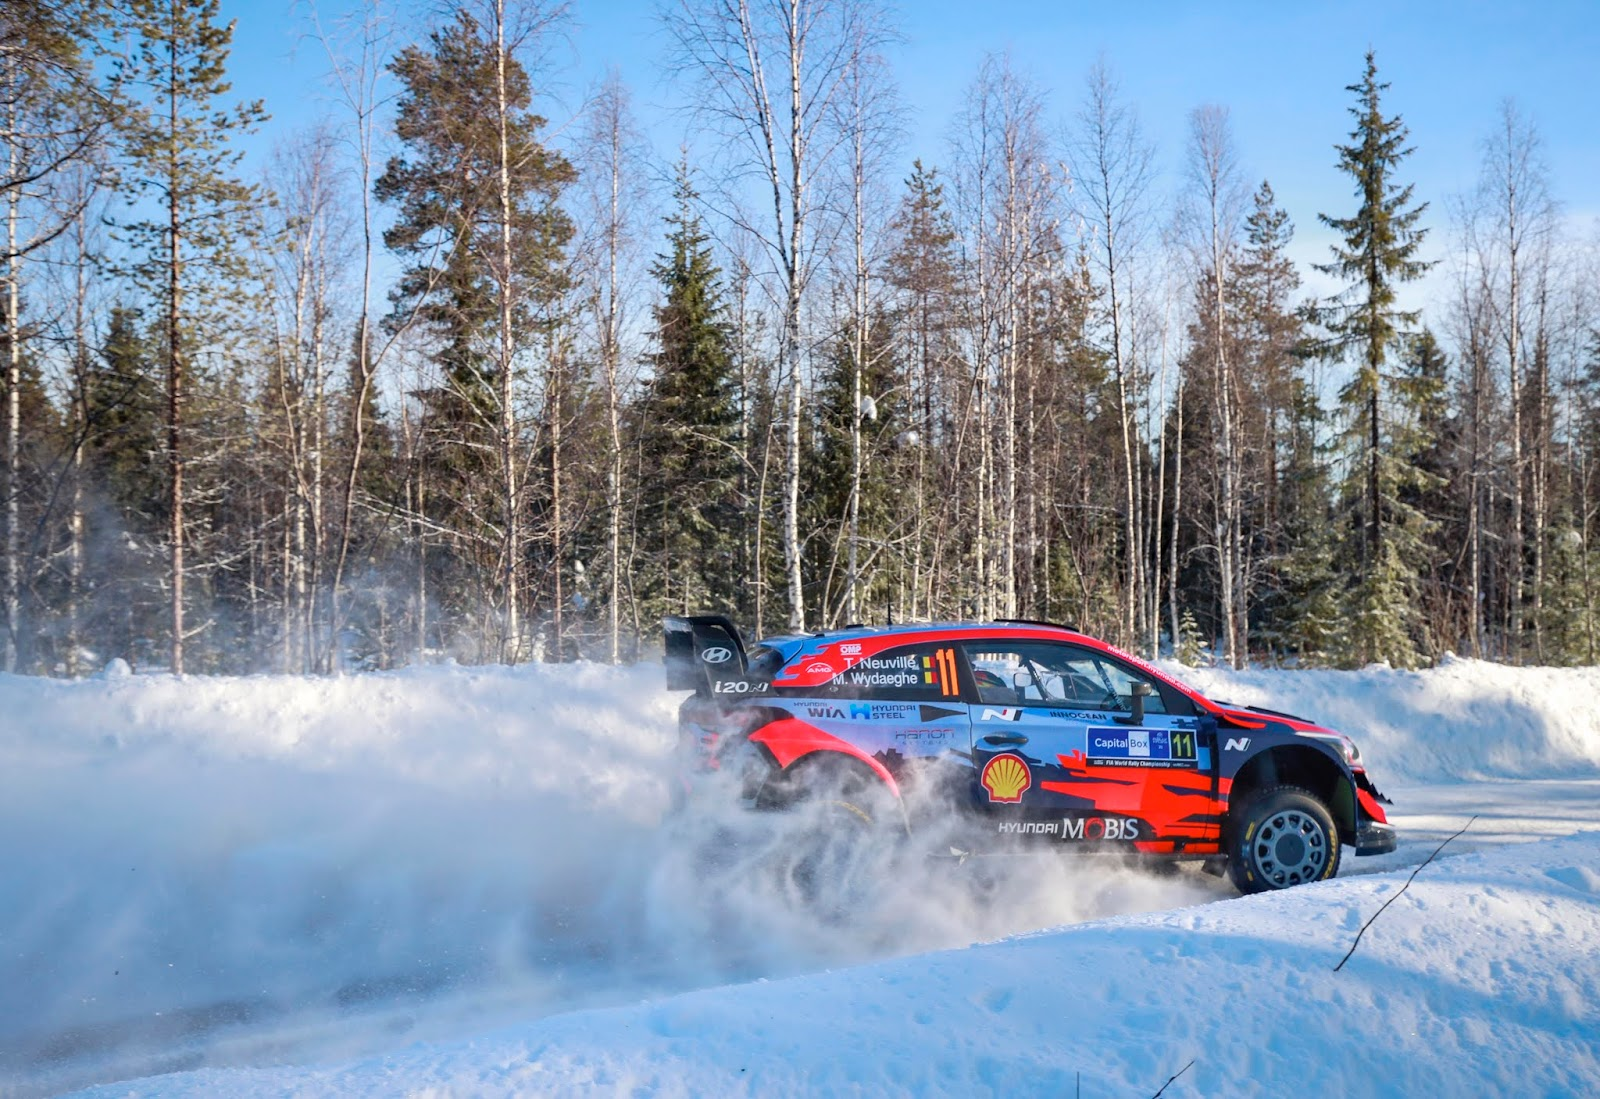 i202BWRC Arctic Rally Finland 1 Διπλή νίκη για την Hyundai στο Arctic Rally Finland Arctic Rally, Hyundai, Hyundai i20, Hyundai i20 WRC, ειδήσεις